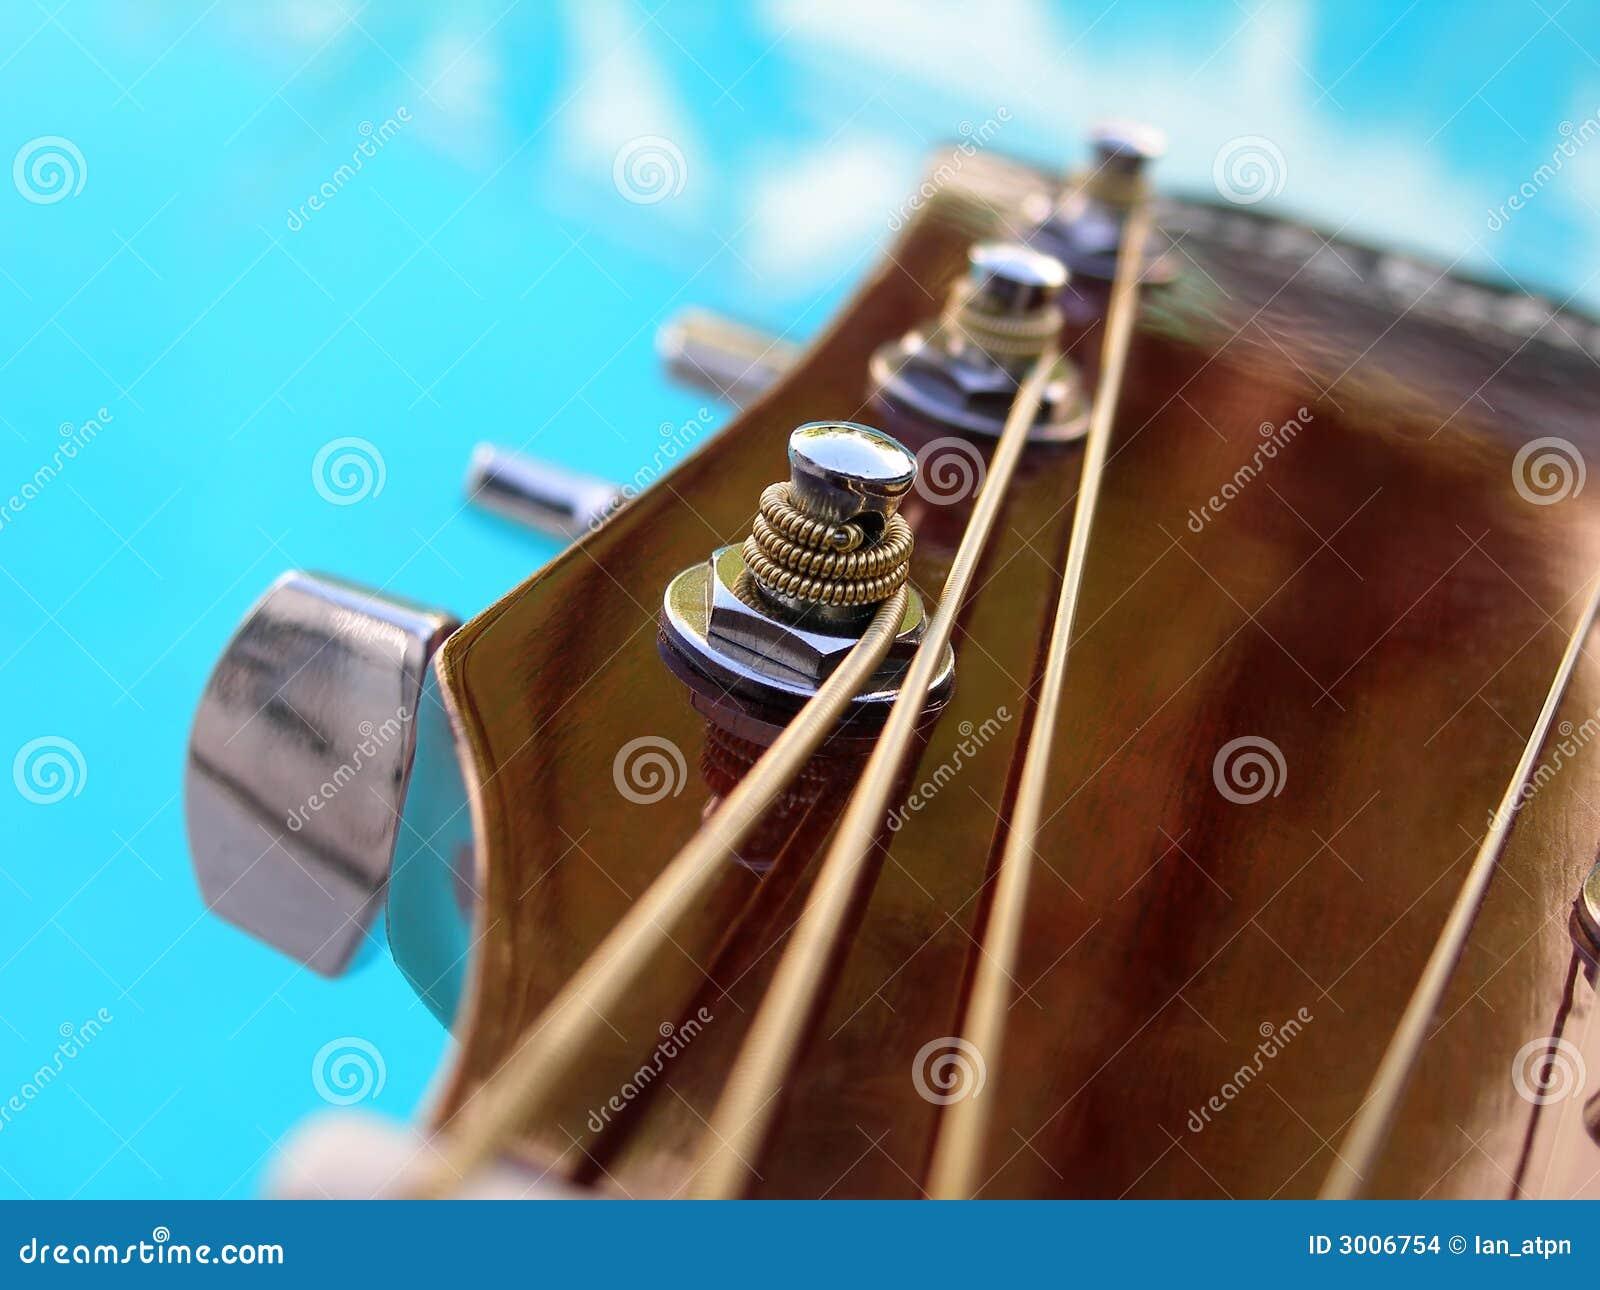 close up shot of guitar string stock photo image of wood instrument 3006754. Black Bedroom Furniture Sets. Home Design Ideas